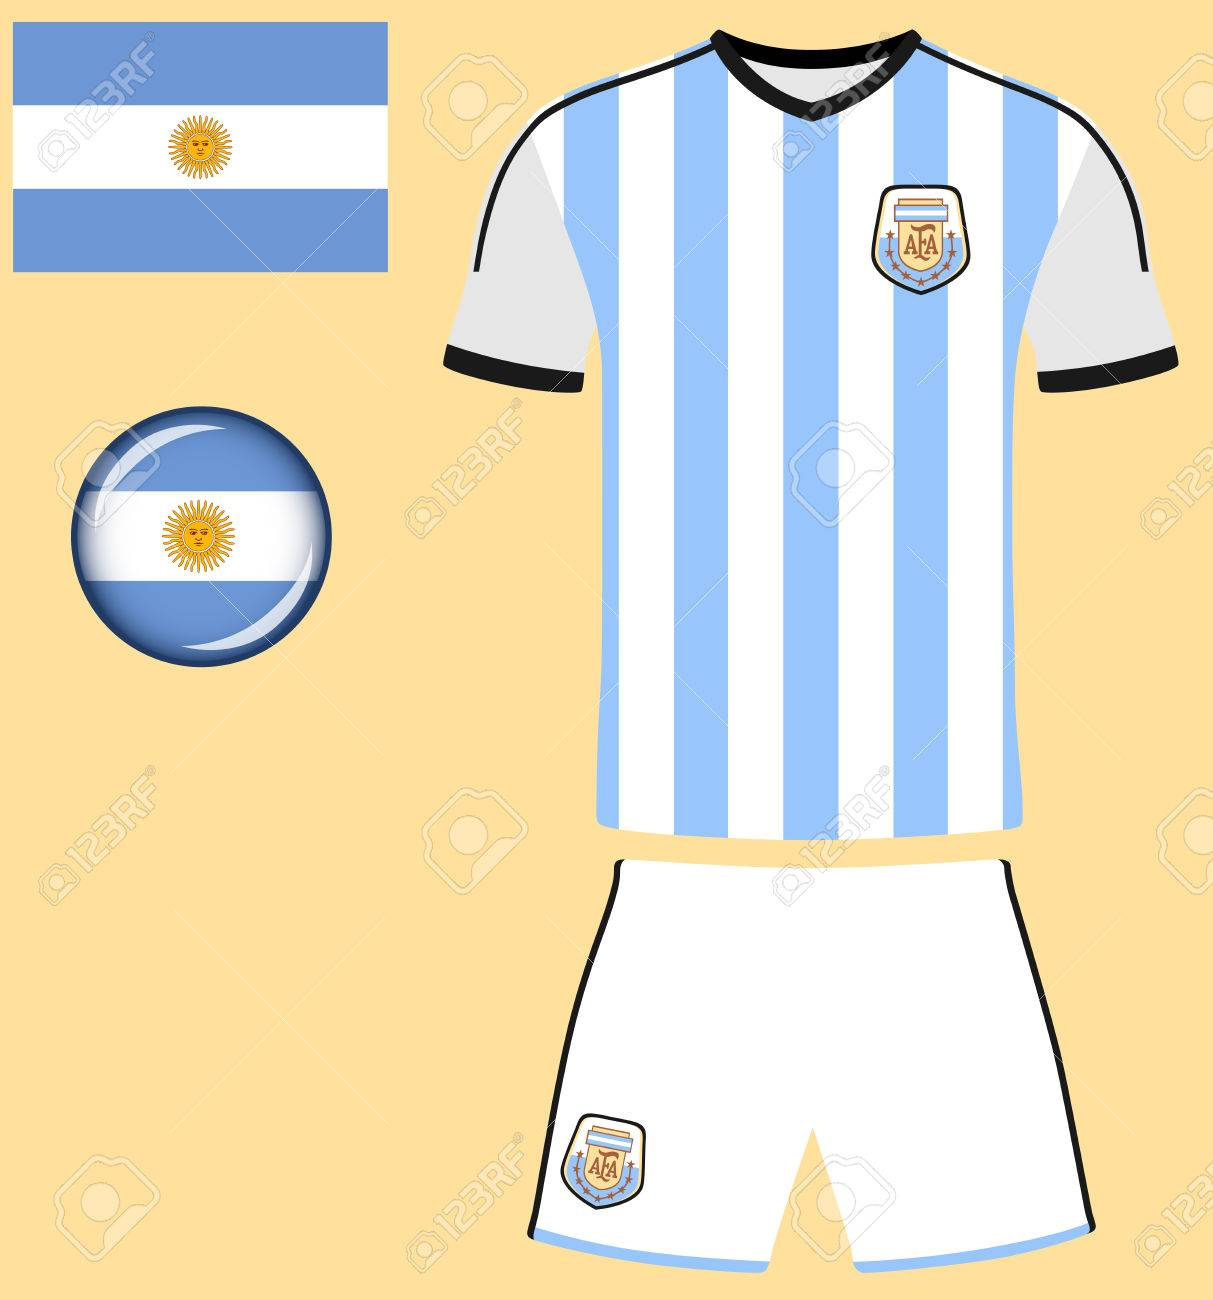 argentine jersey football vector graphique image repr sentant le rh fr 123rf com